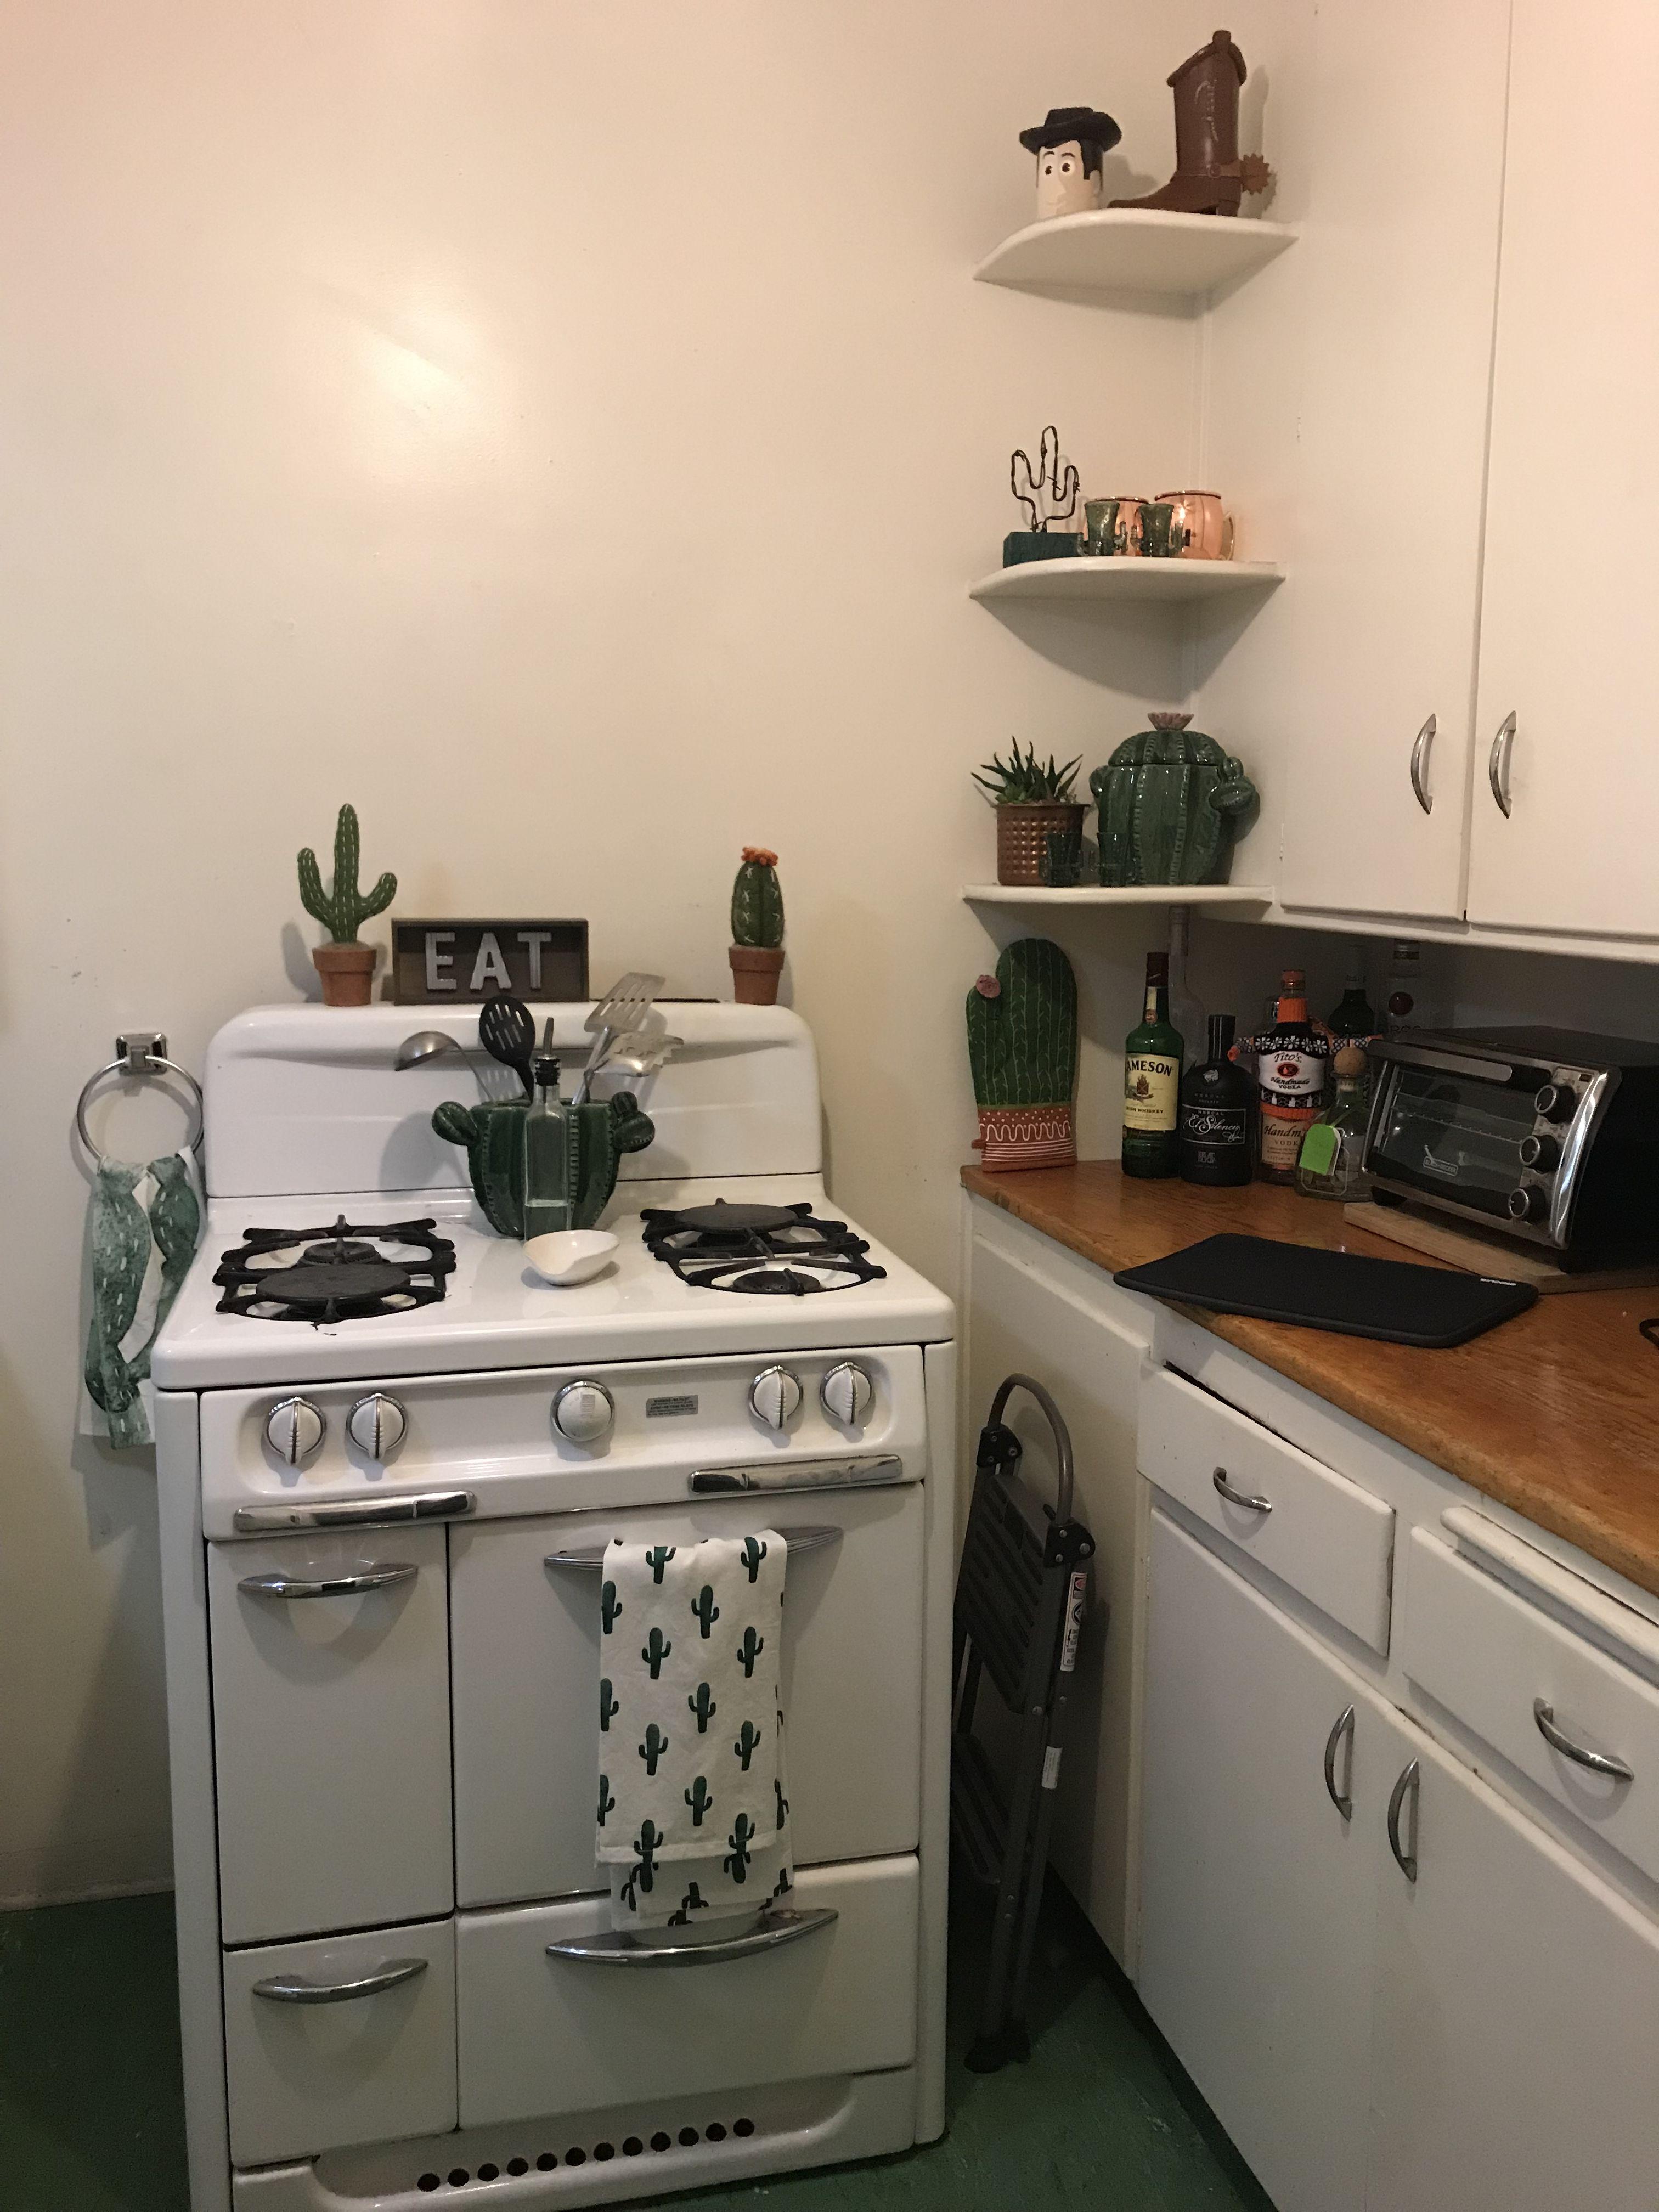 Kitchen Cactus decor  Kitchen decor, Kitchen, Kitchen inspirations